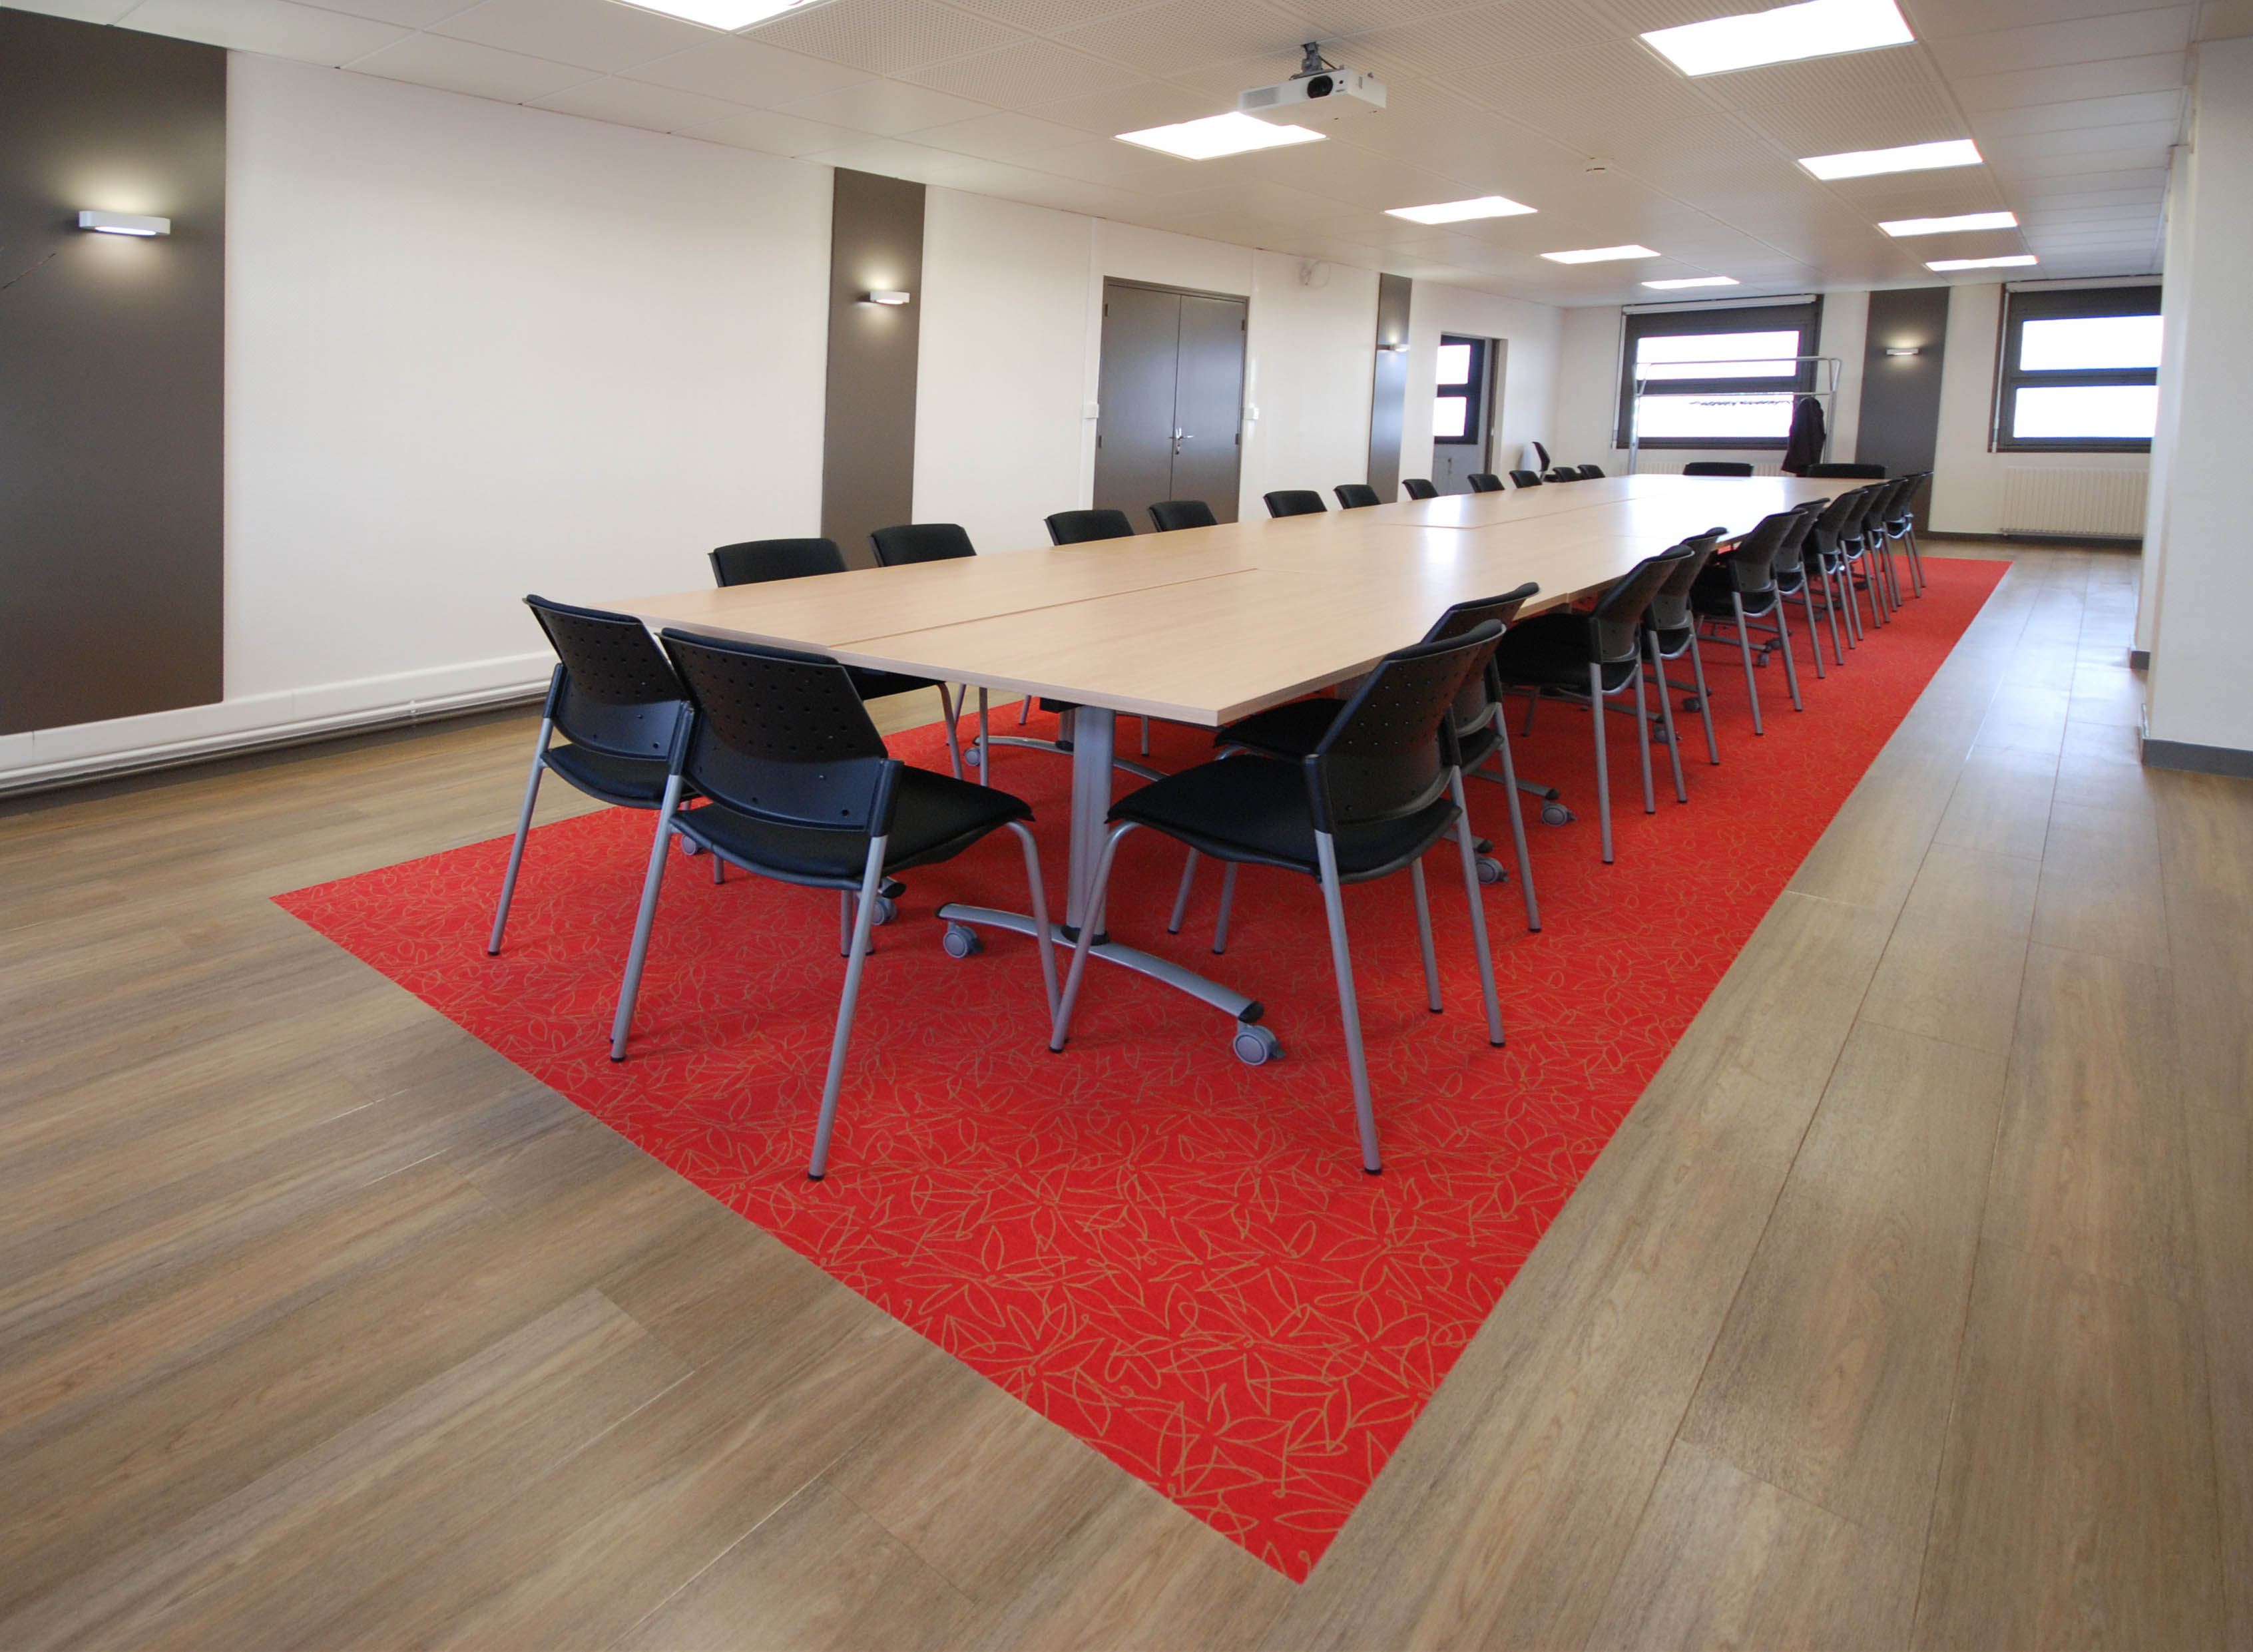 Harmonie habitat location salles de r union for Reglementation capacite salle de reunion